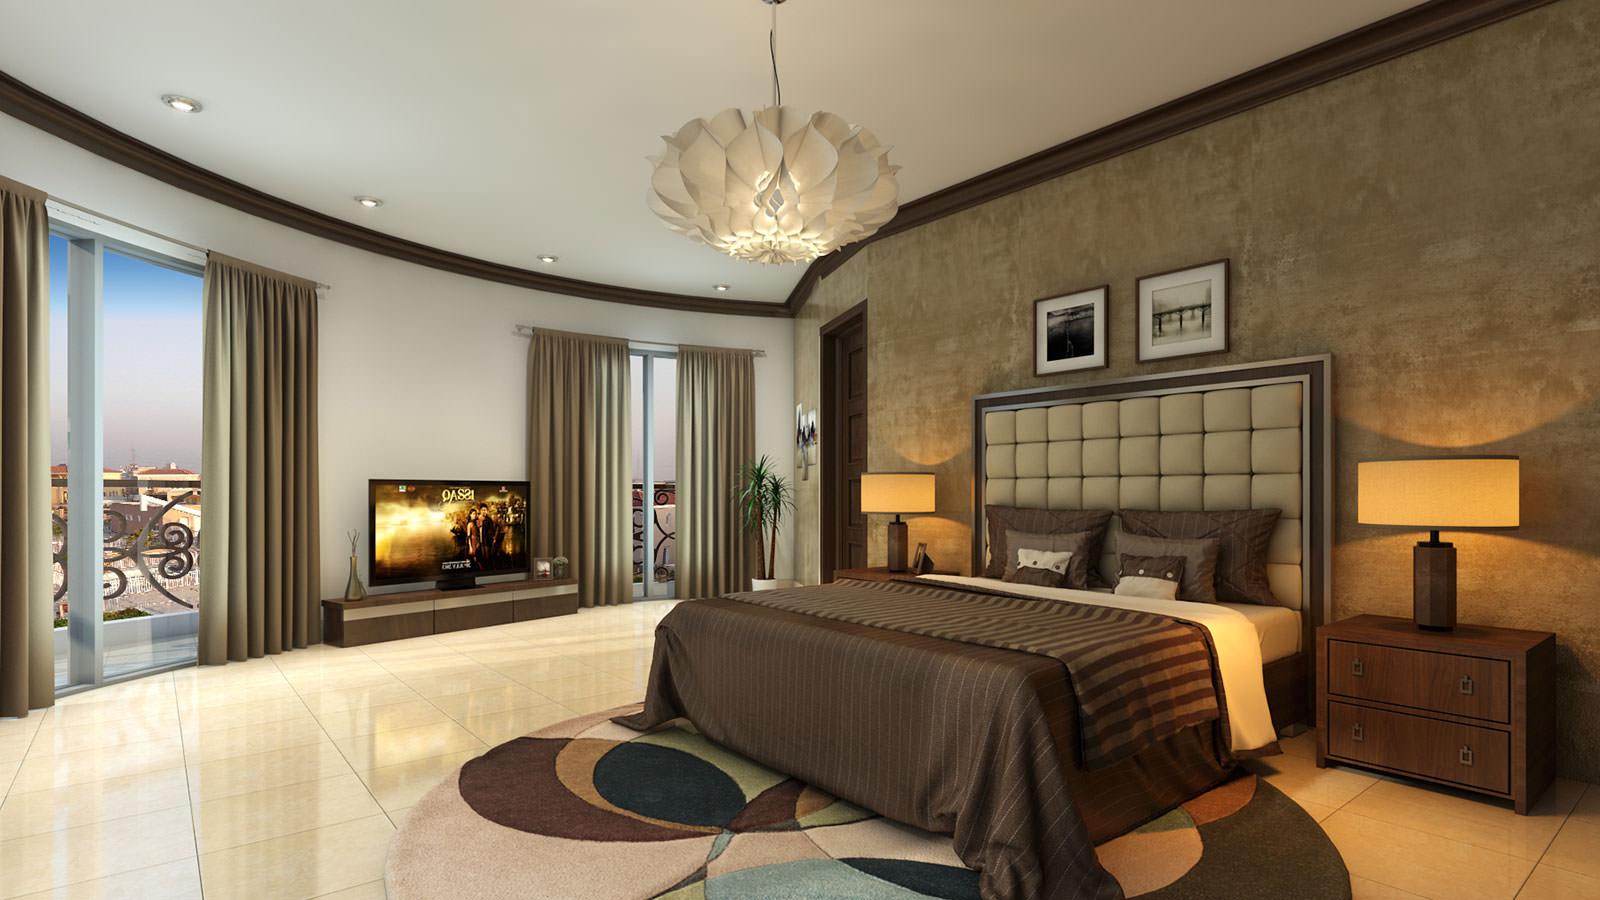 How Realistic Rendering Benefits Interior Designers?